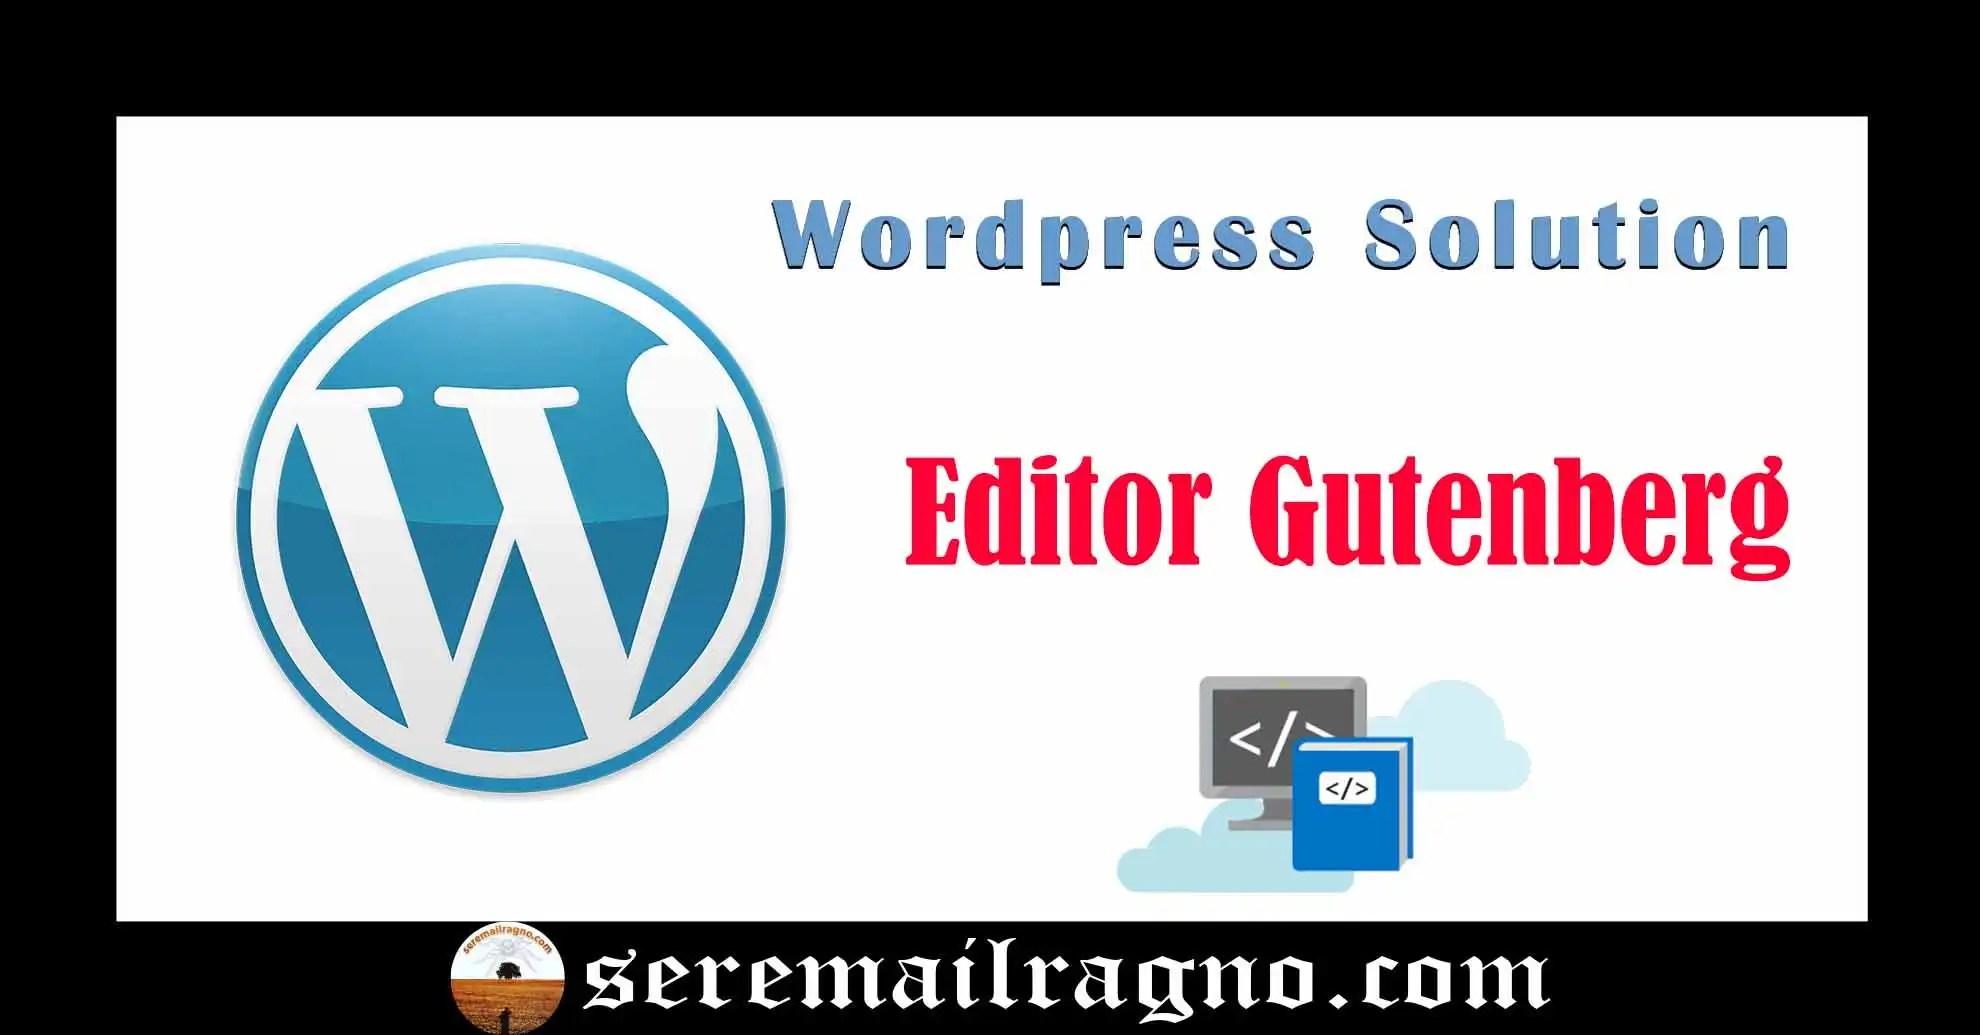 WordPress: arriva il rivoluzionario plugin Gutenberg